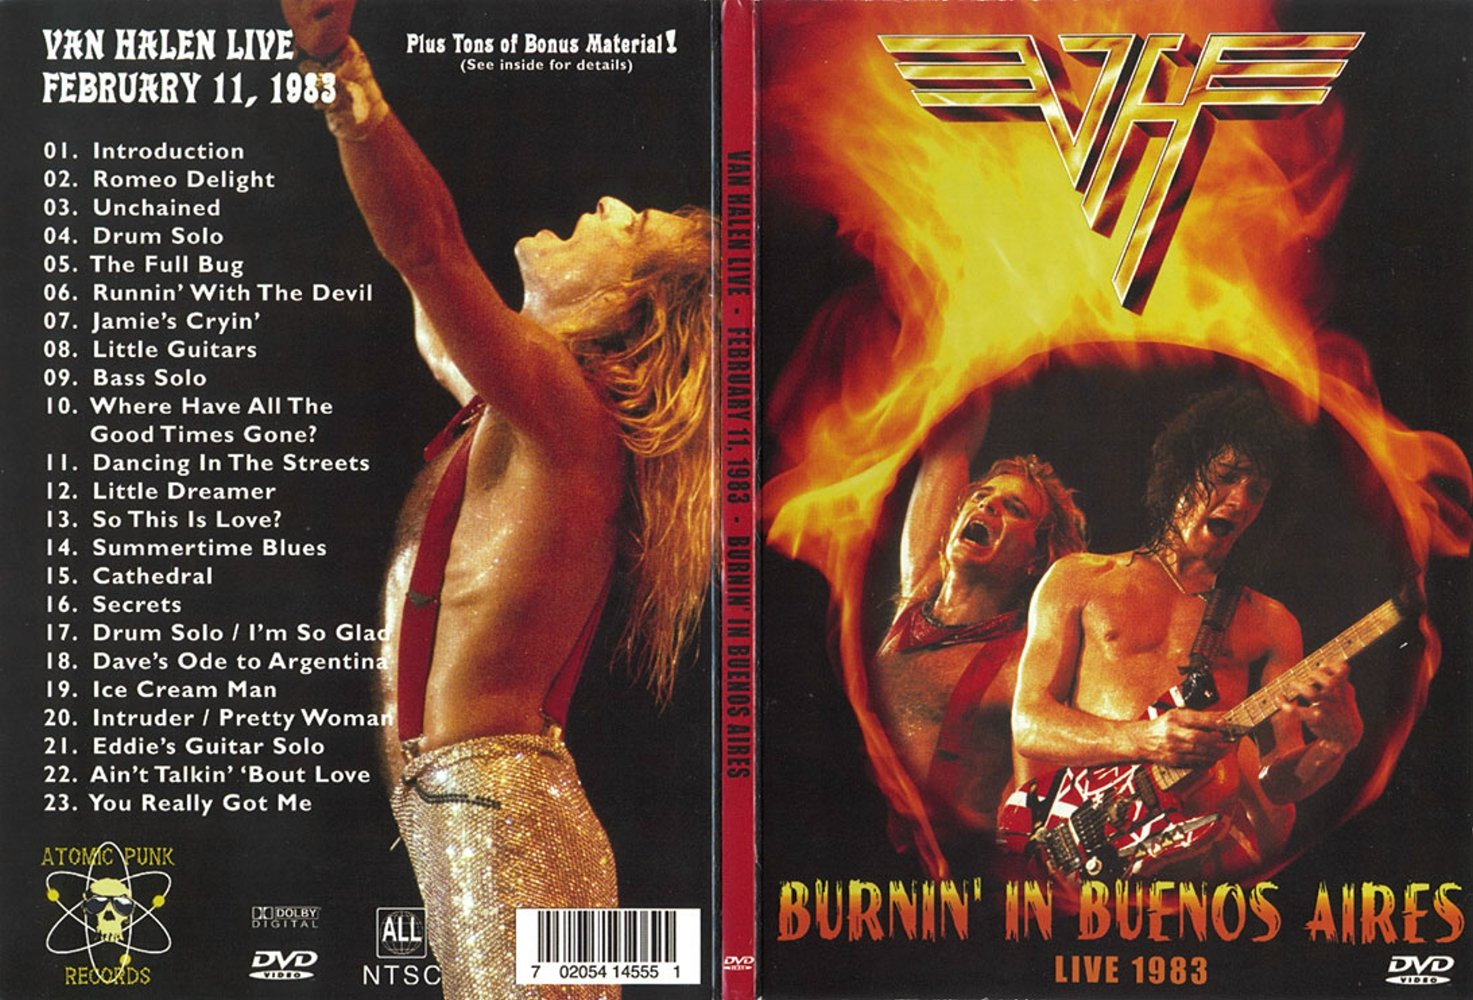 http://4.bp.blogspot.com/_brcl7Spzbn4/S_KUeRmiYUI/AAAAAAAAAag/TN5dXi7_6_g/s1600/Van+Halen+-+Live+February+11-1983+Burnin+In+Buenos+Aires.jpg